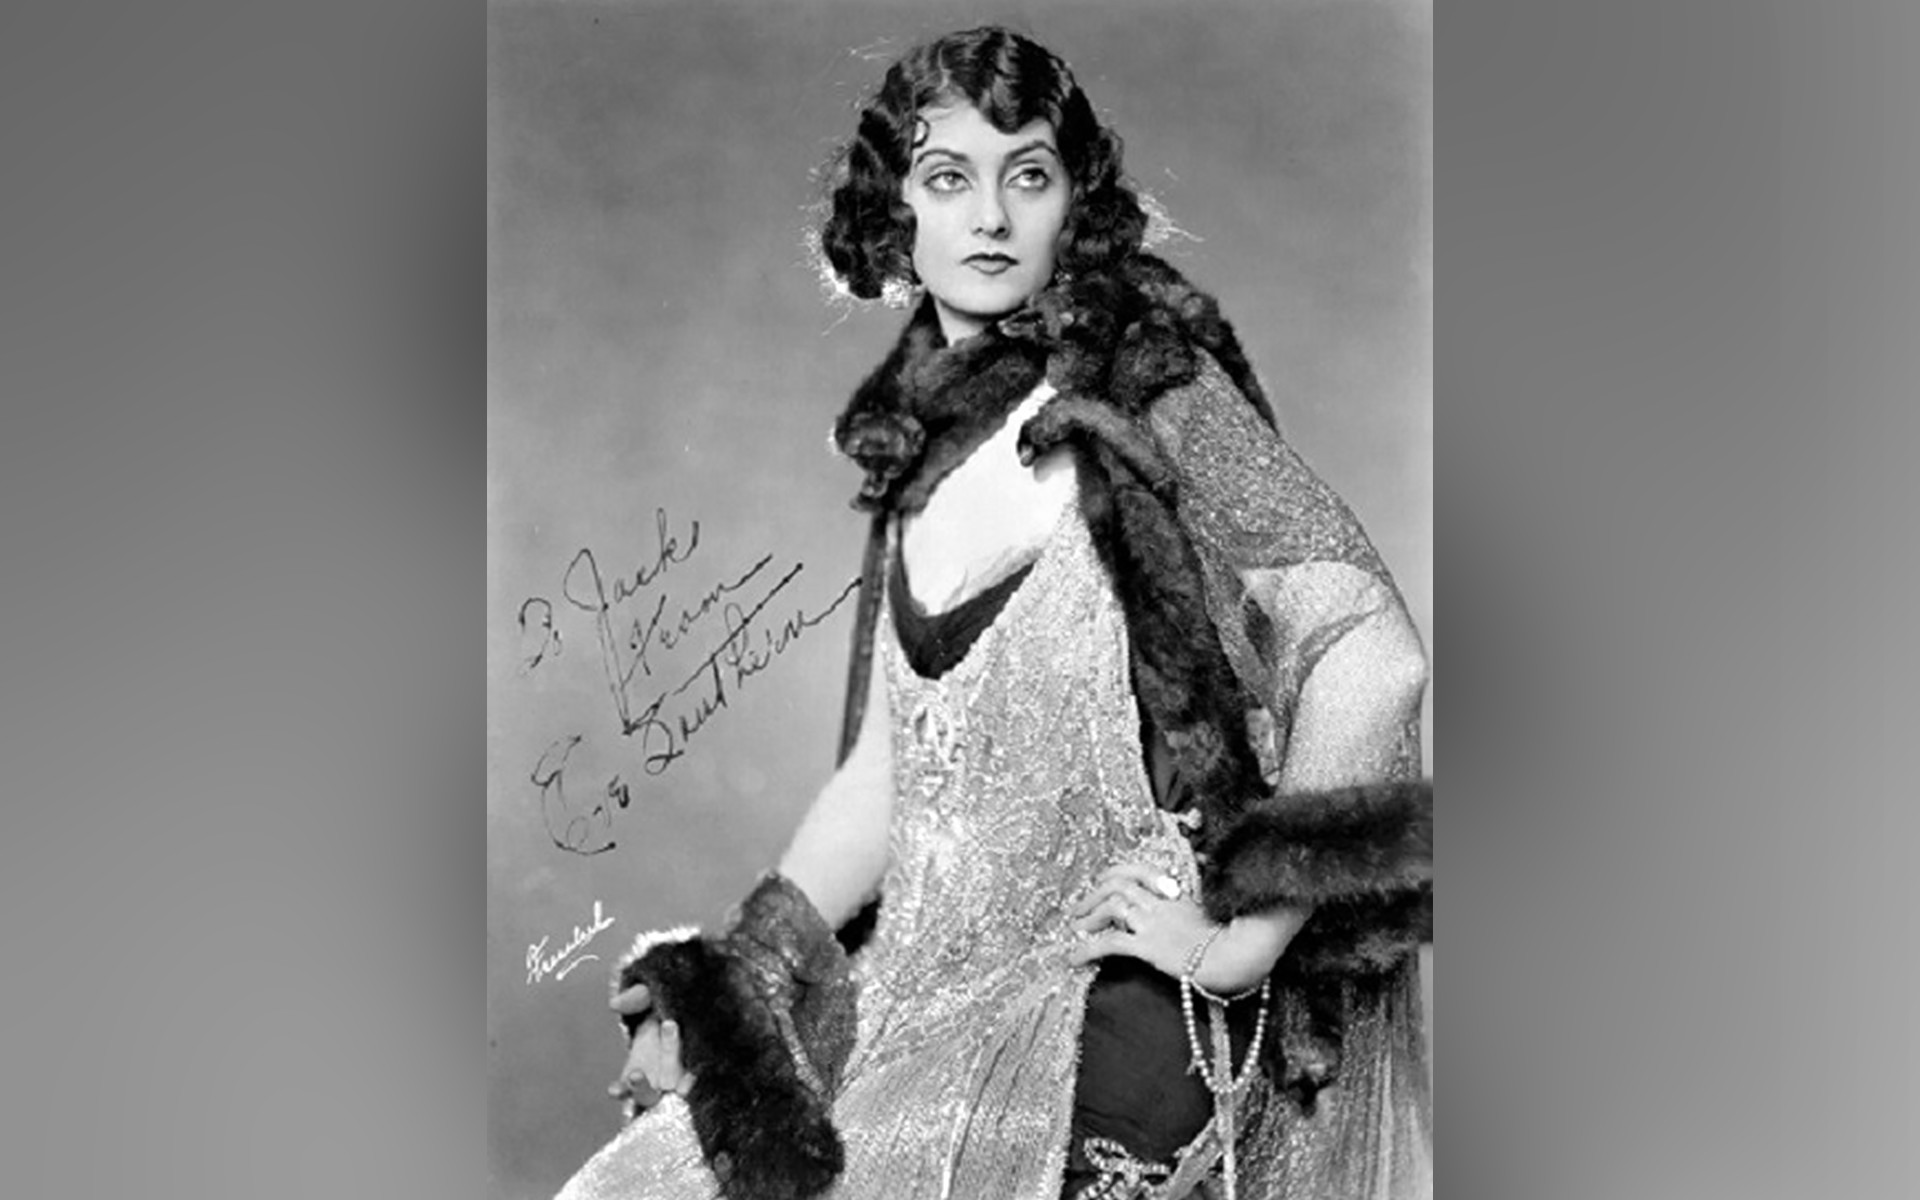 Eve Southern, an actress who played Anastasia